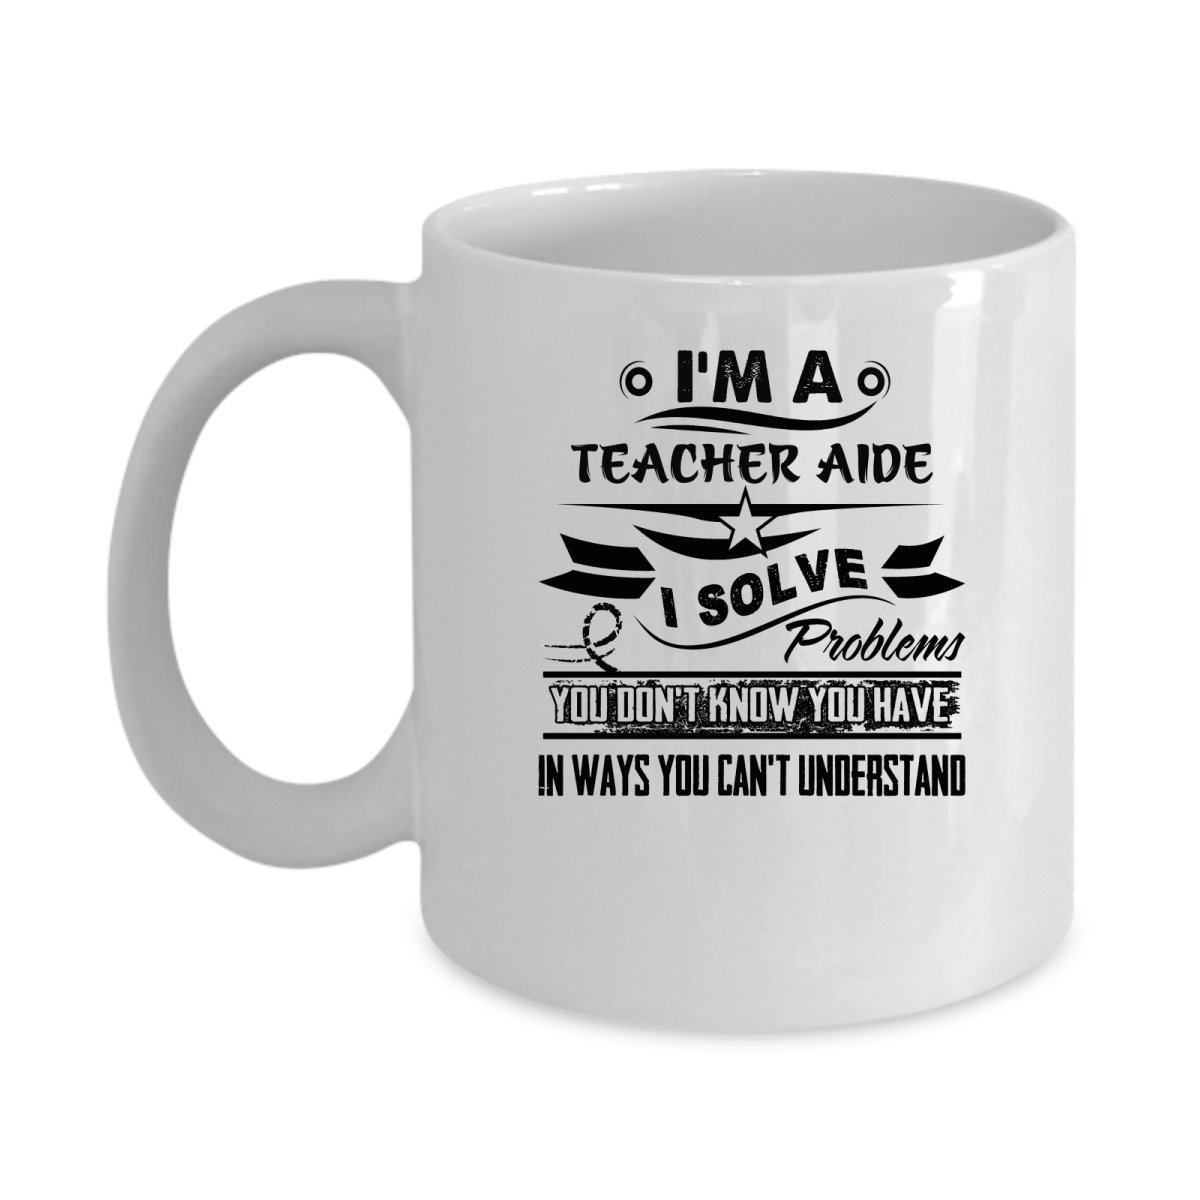 Funny TEACHER AIDE Jobs Mugs - I